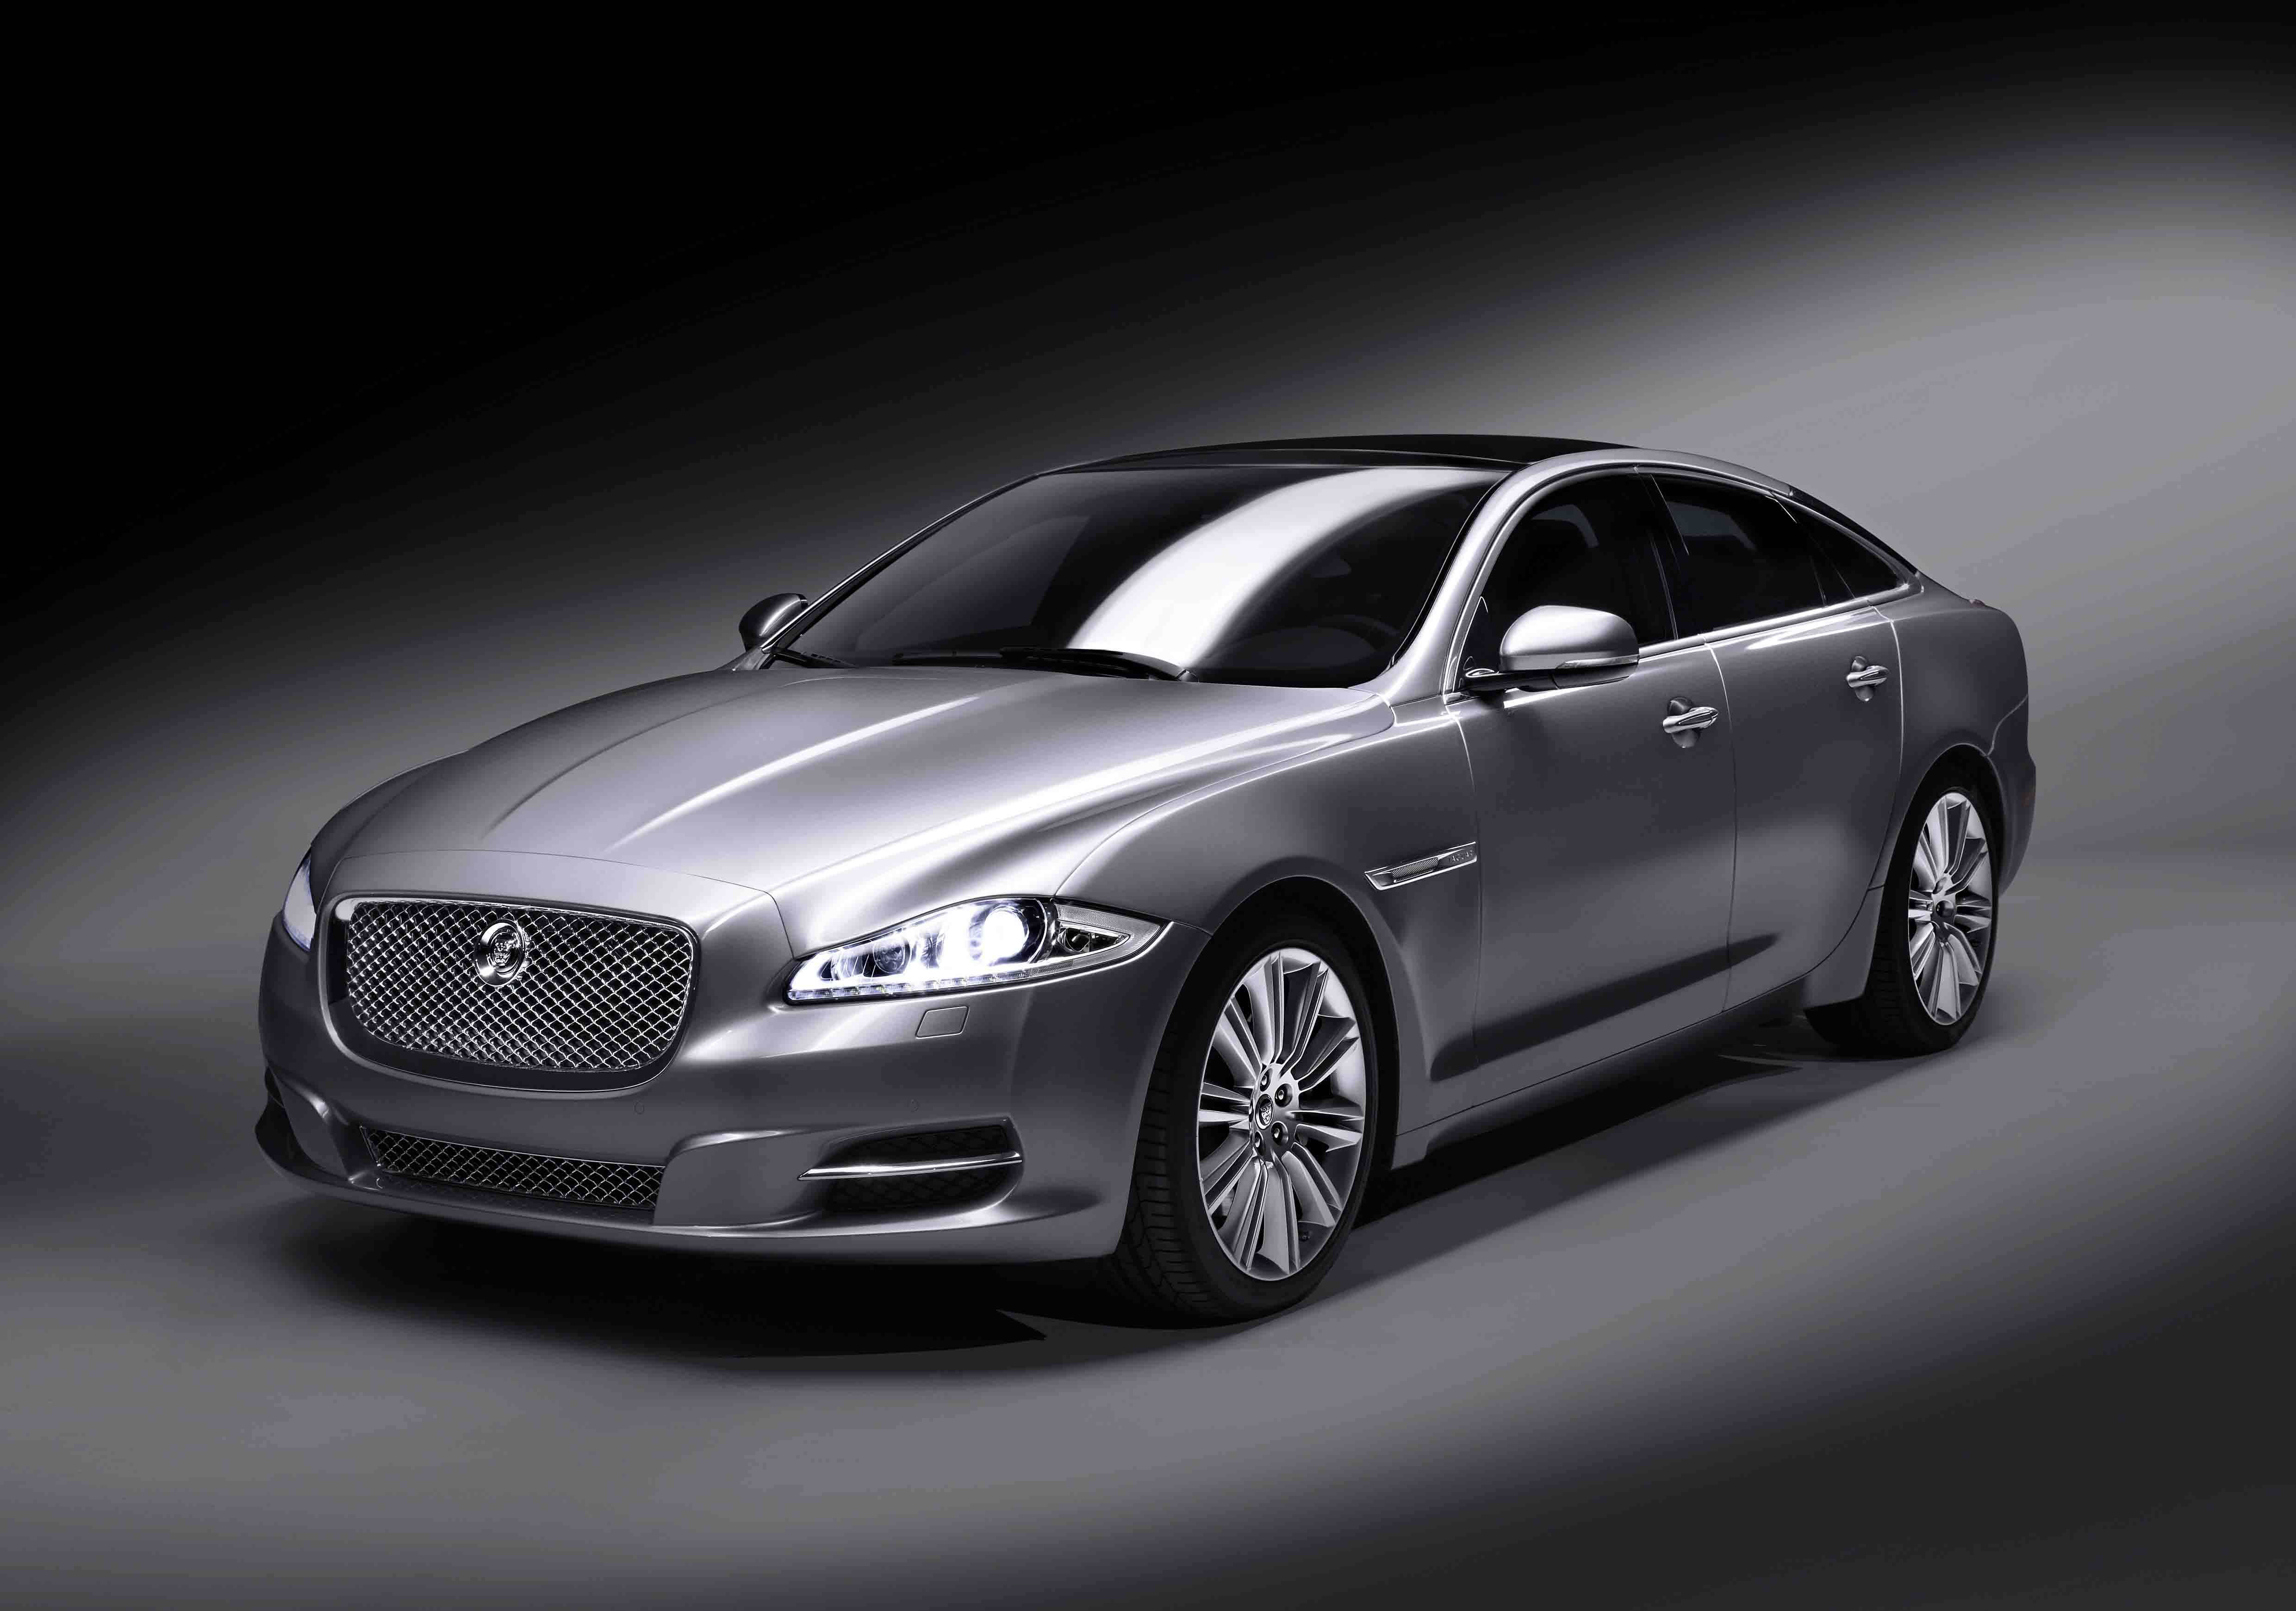 jaguar xj india price review images jaguar cars. Black Bedroom Furniture Sets. Home Design Ideas